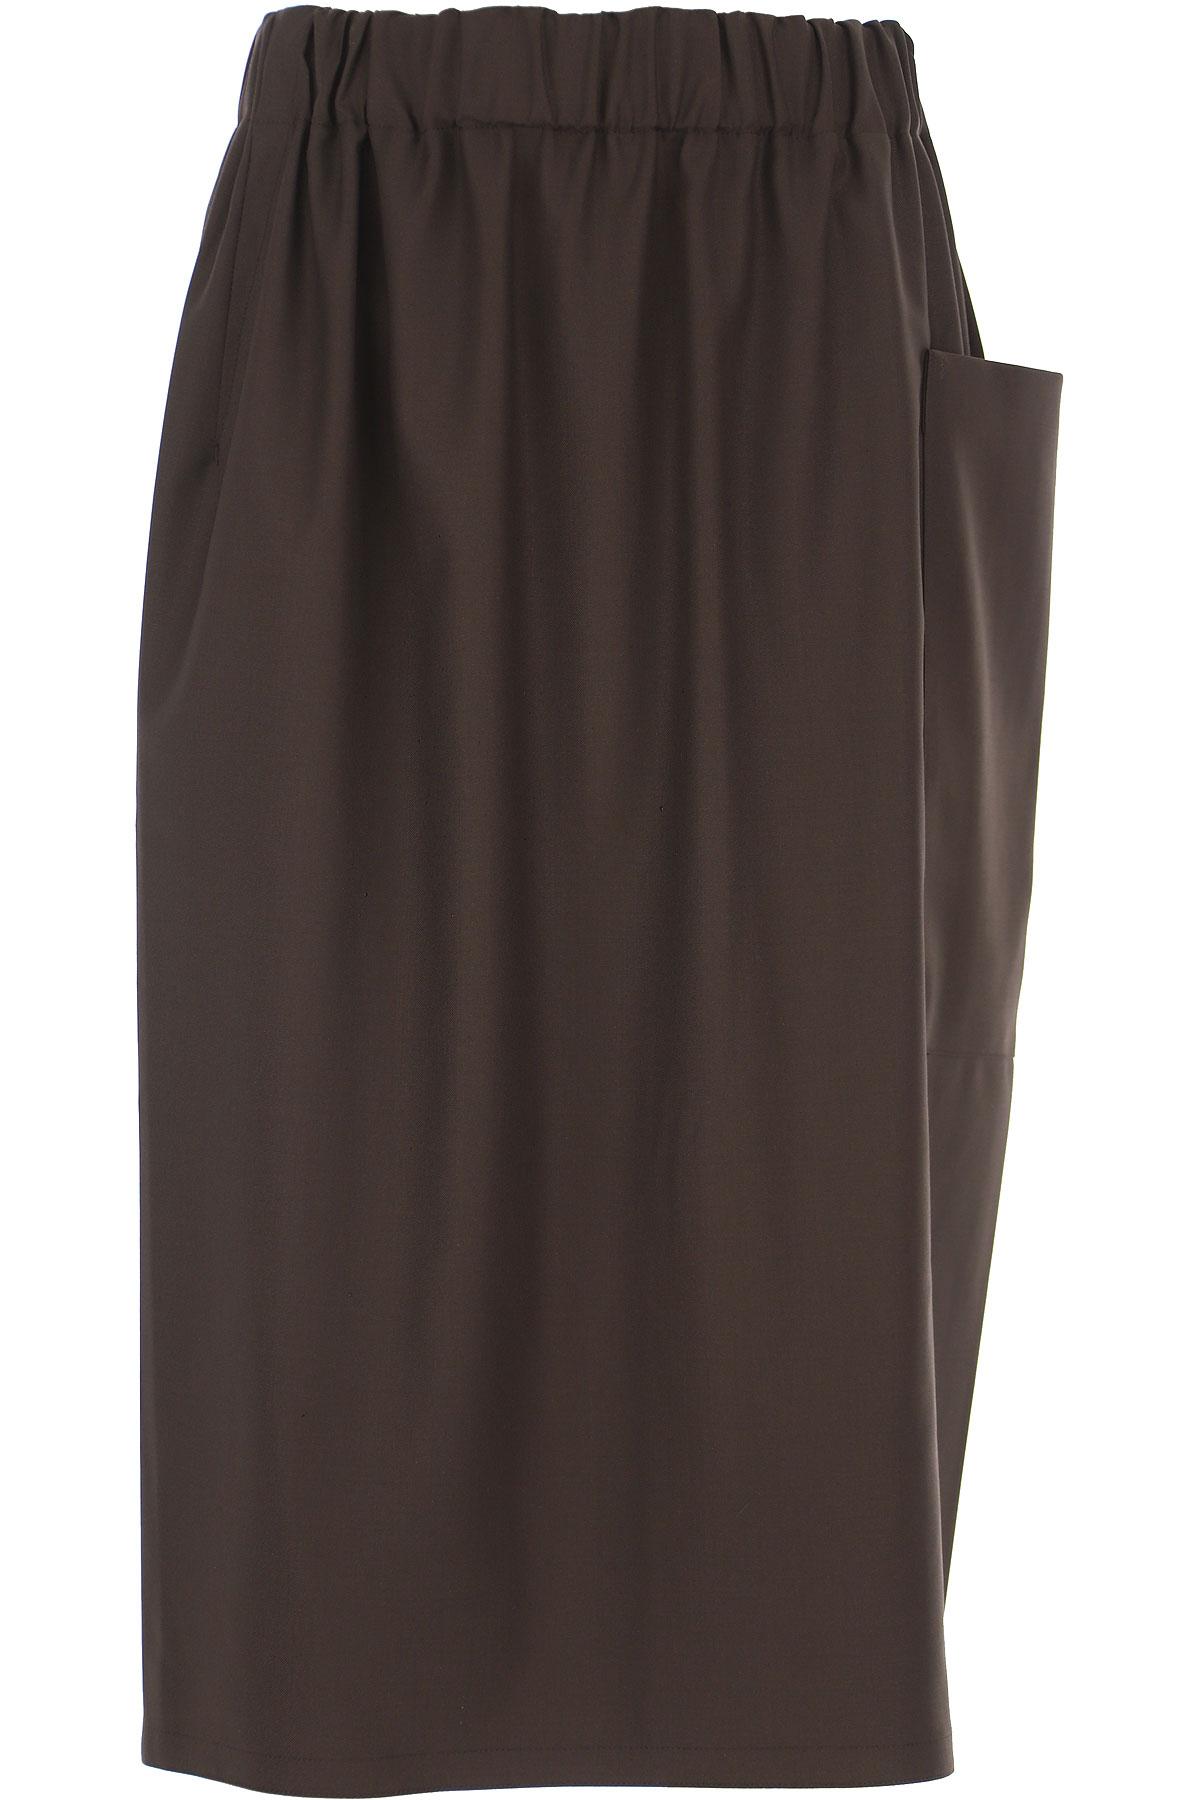 Sofie dHoore Skirt for Women On Sale, Chocolate, Wool, 2019, FR 36 • IT 40 FR 38 • IT 42 FR 40 • IT 44